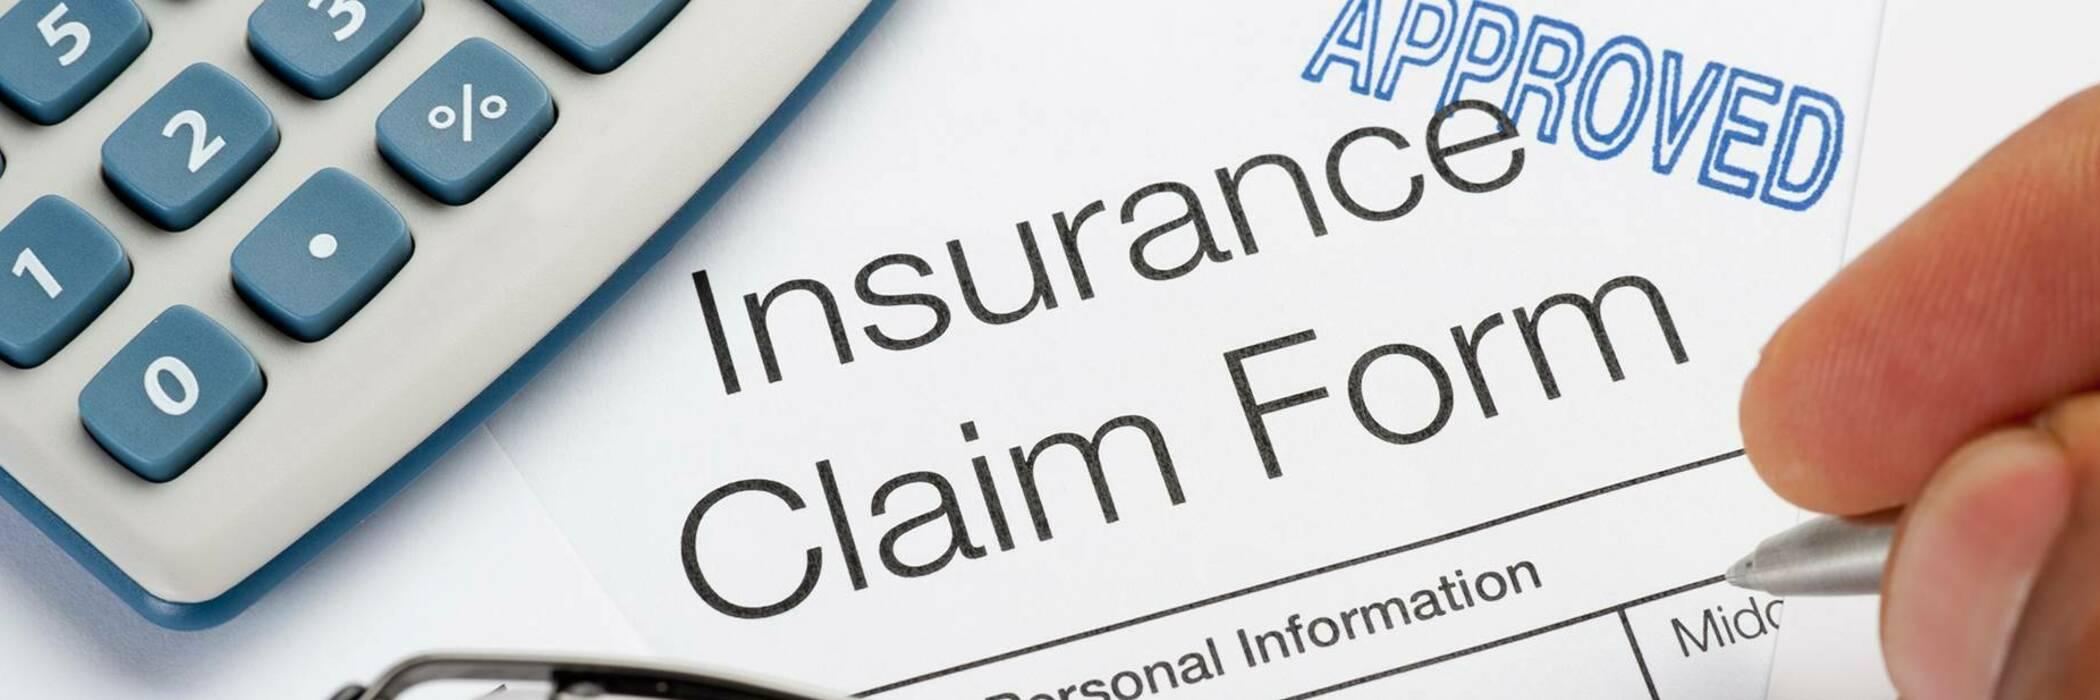 Building and renovation insurance hero